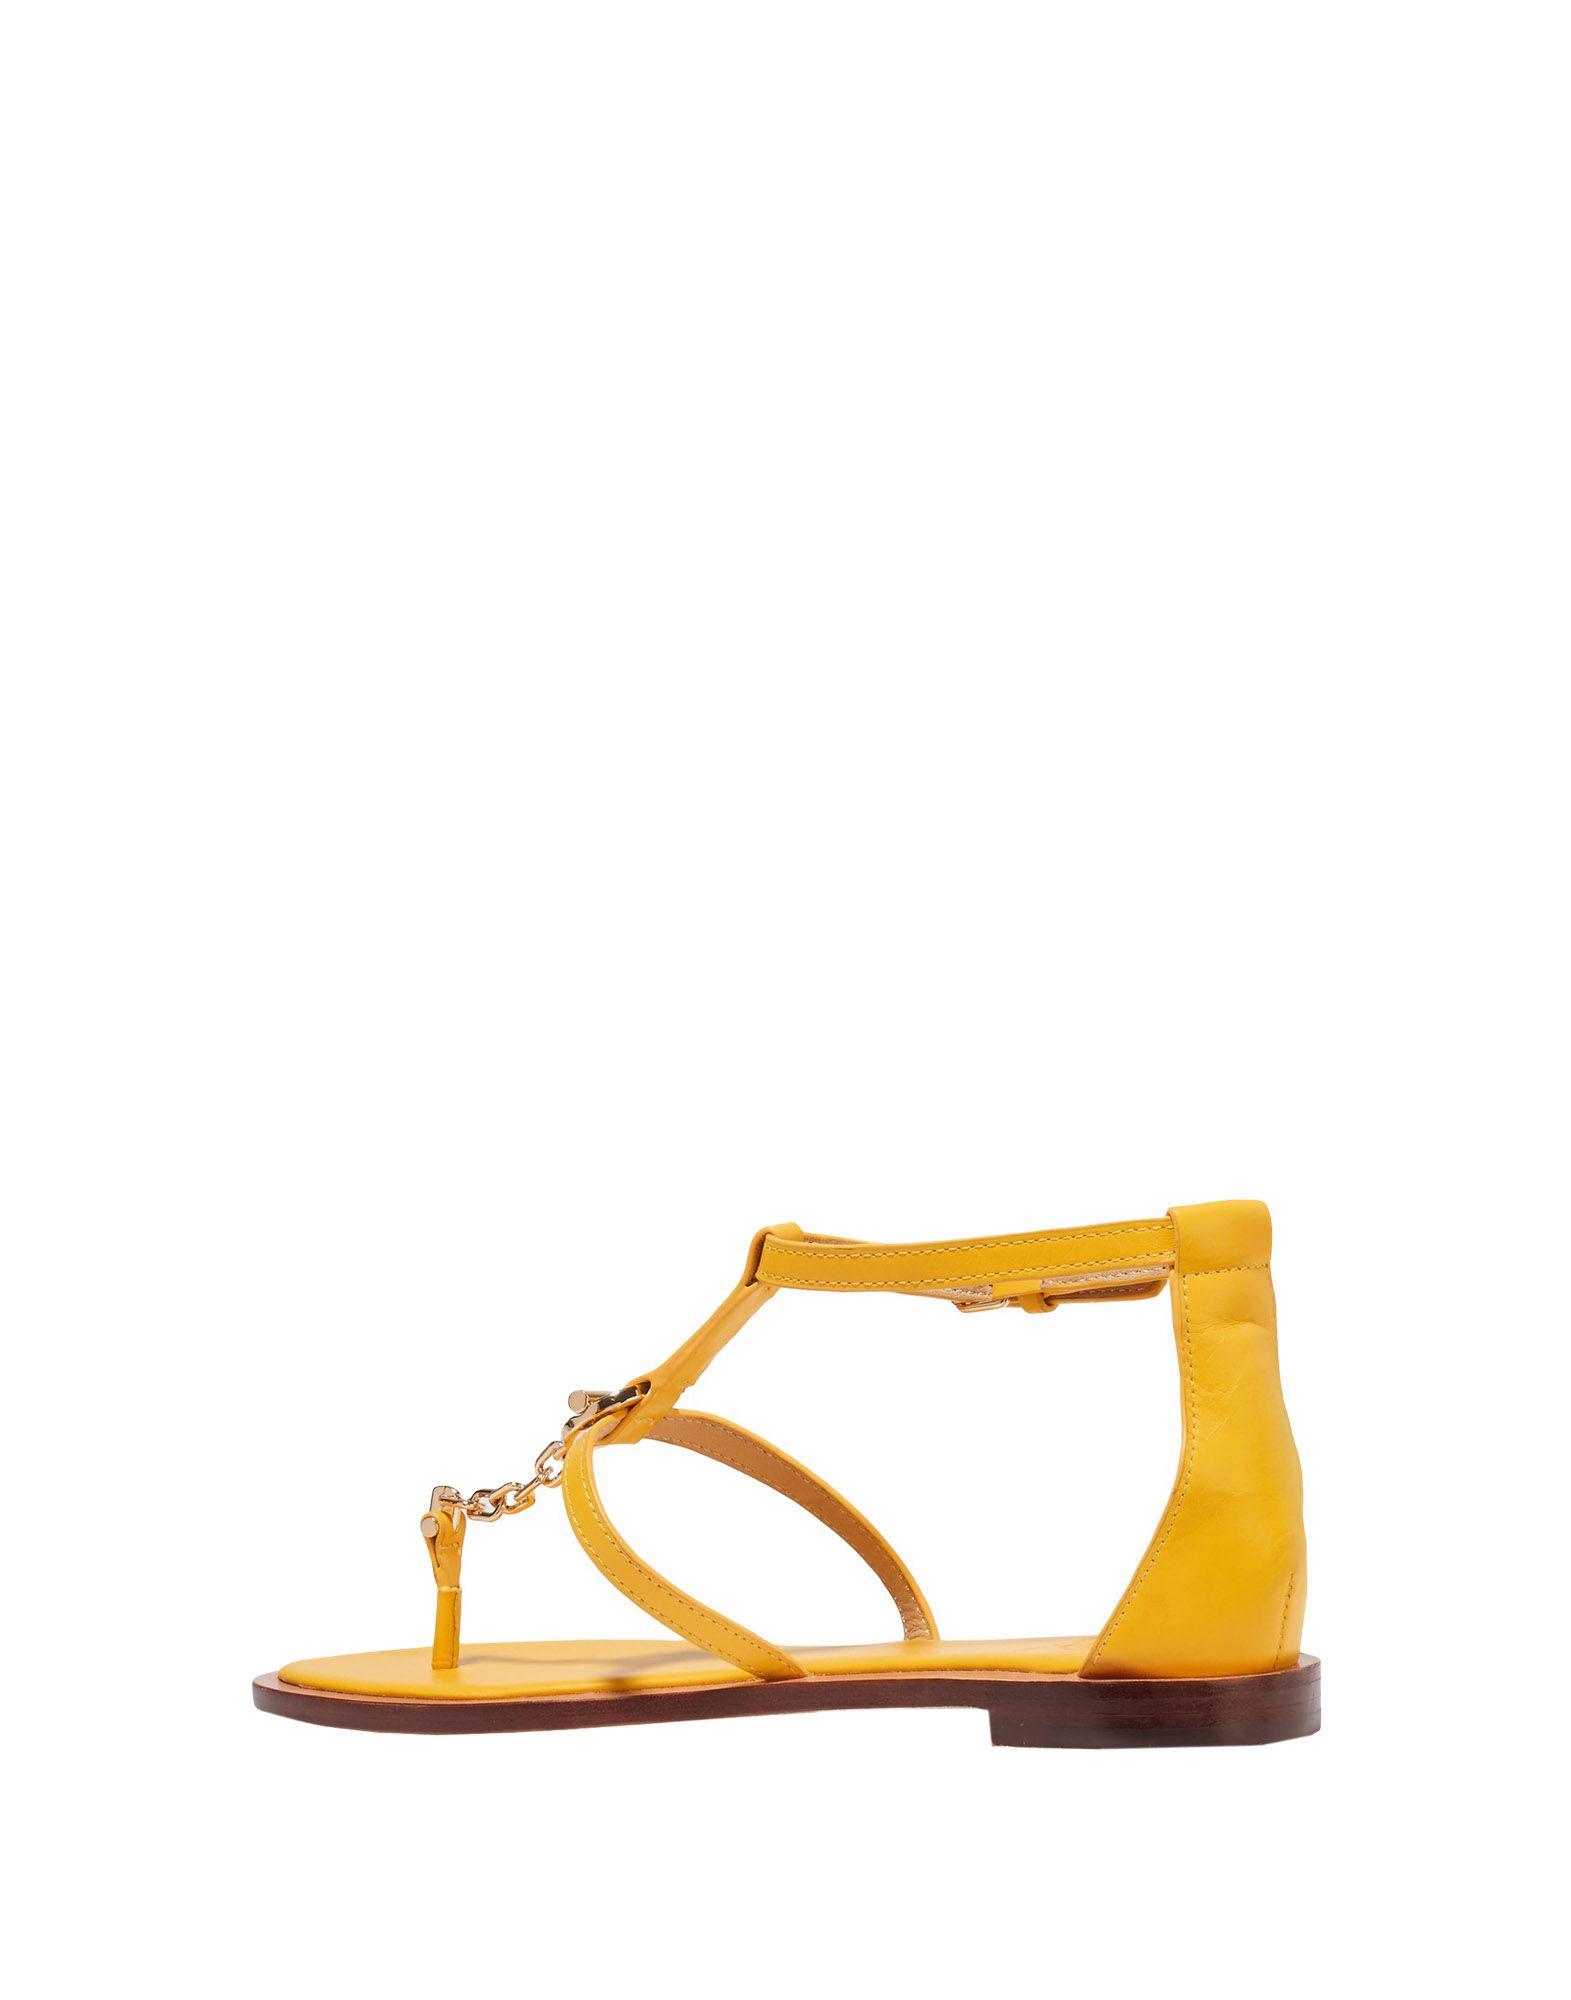 Stilvolle billige Schuhe Tory 11529943WM Burch Dianetten Damen  11529943WM Tory ace1cb